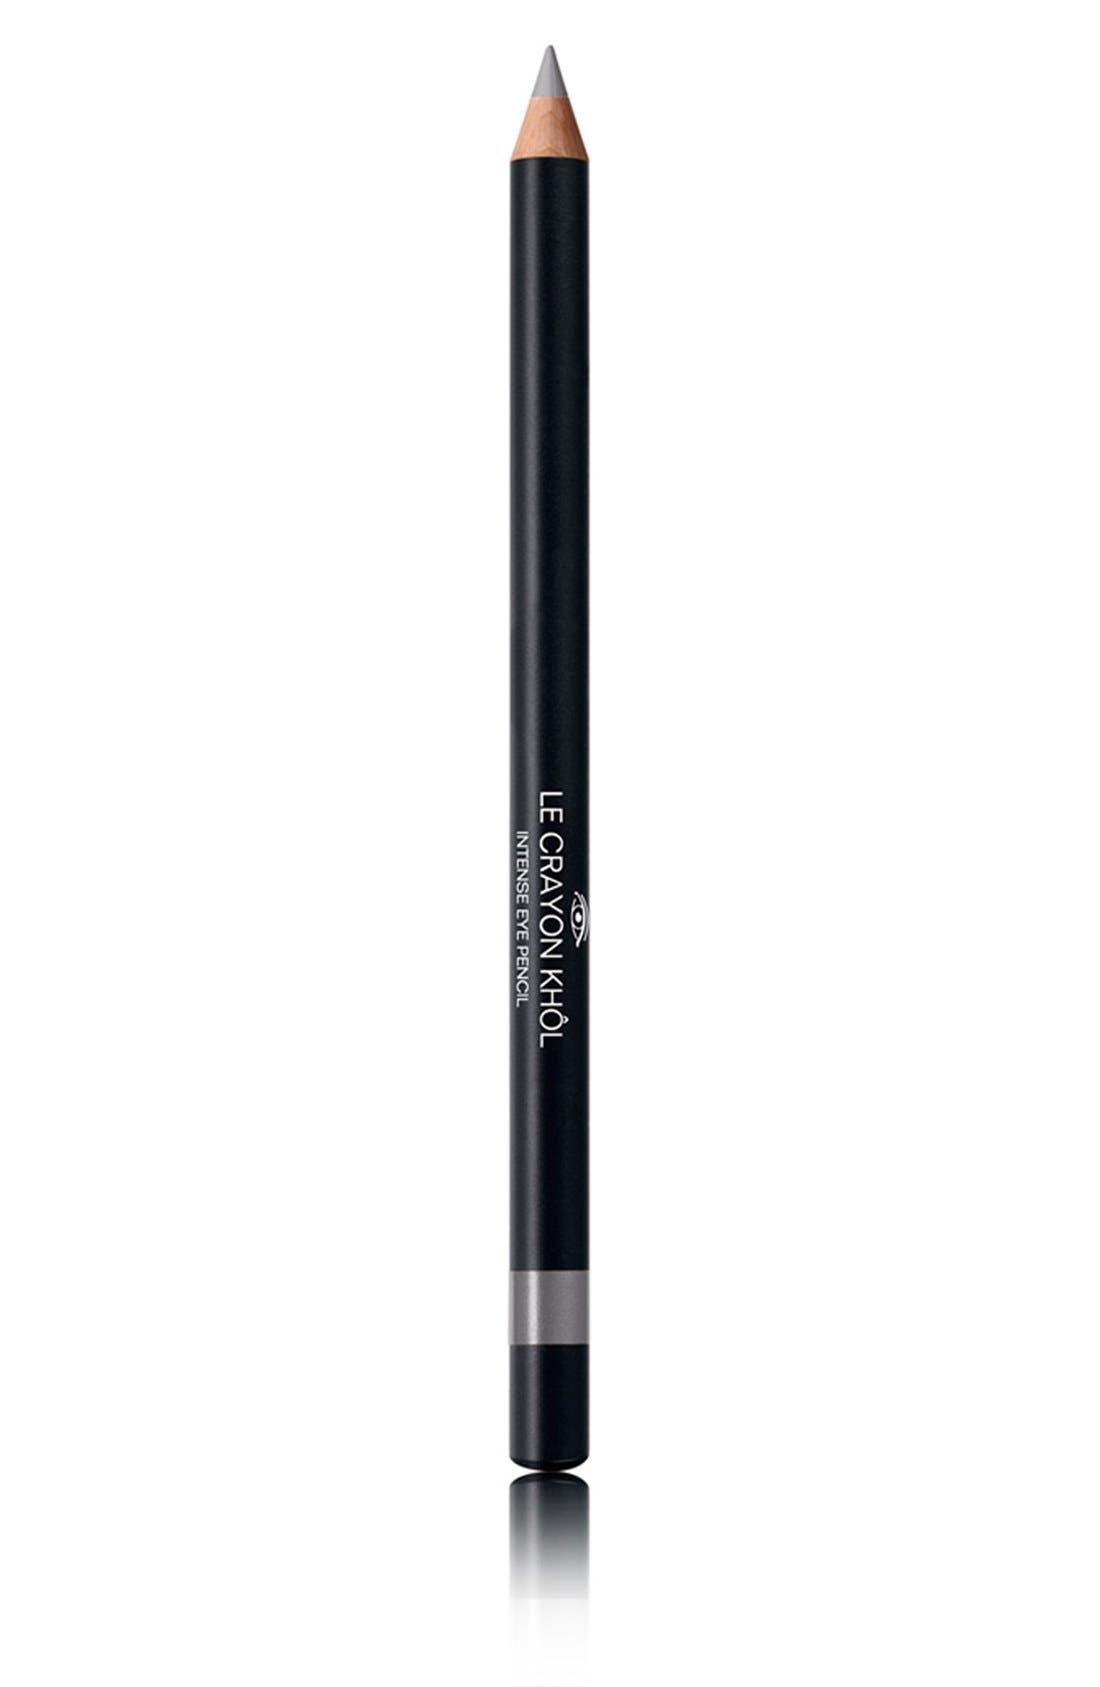 LE CRAYON KHÔL<br />Intense Eye Pencil,                             Main thumbnail 1, color,                             64 GRAPHITE